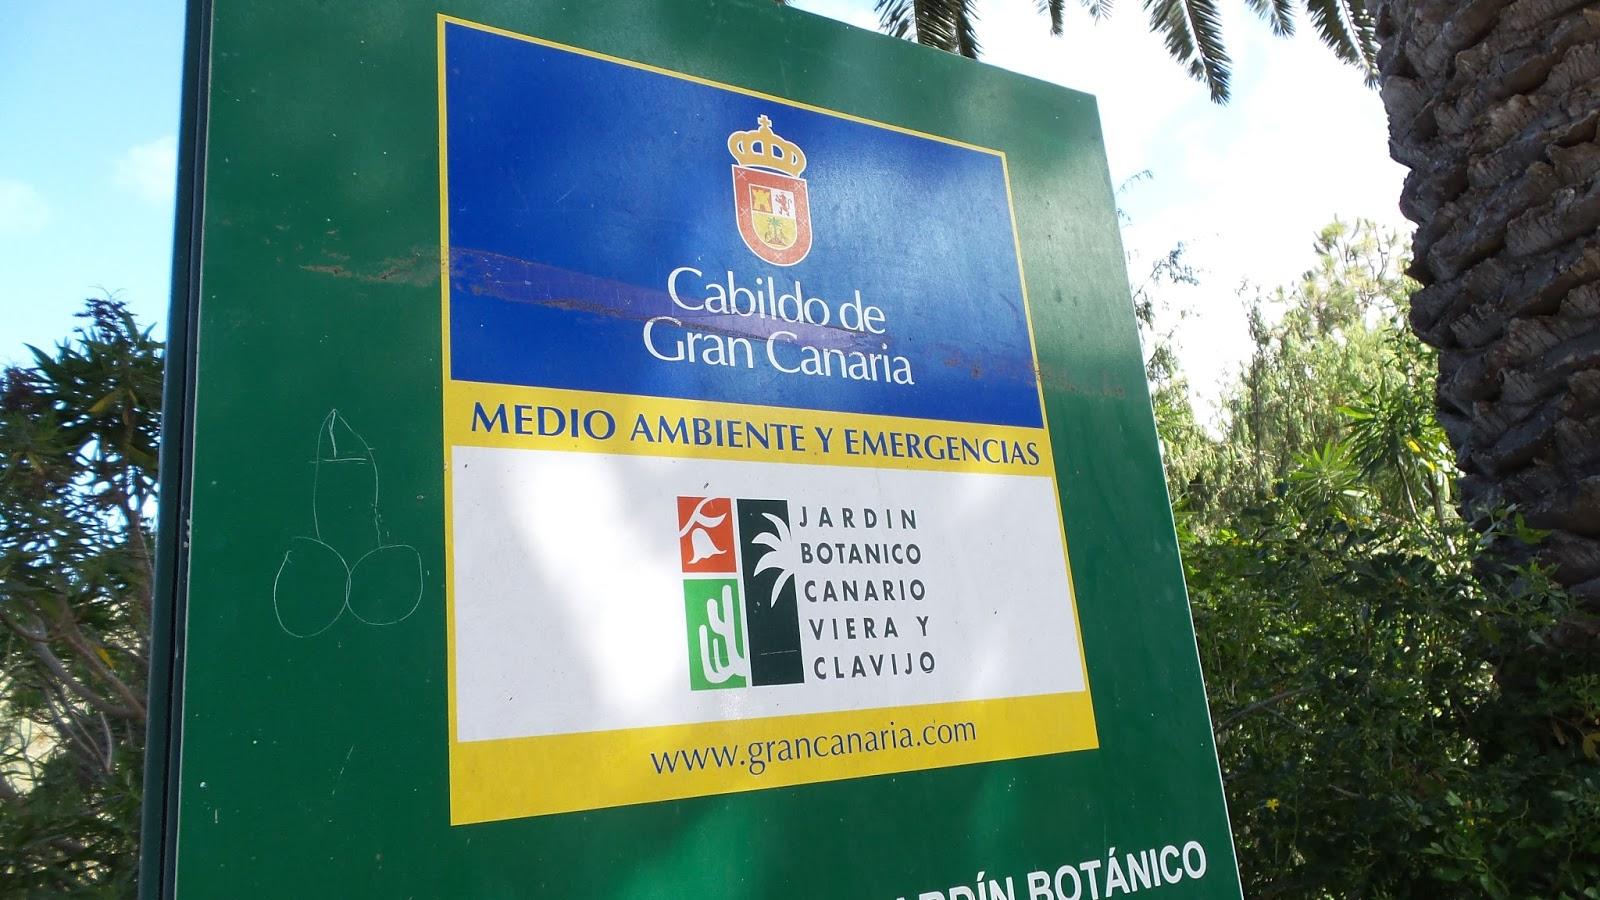 Gran canaria reise info der botanische garten jard n bot nico canario viera y clavijo - Jardin botanico canario ...